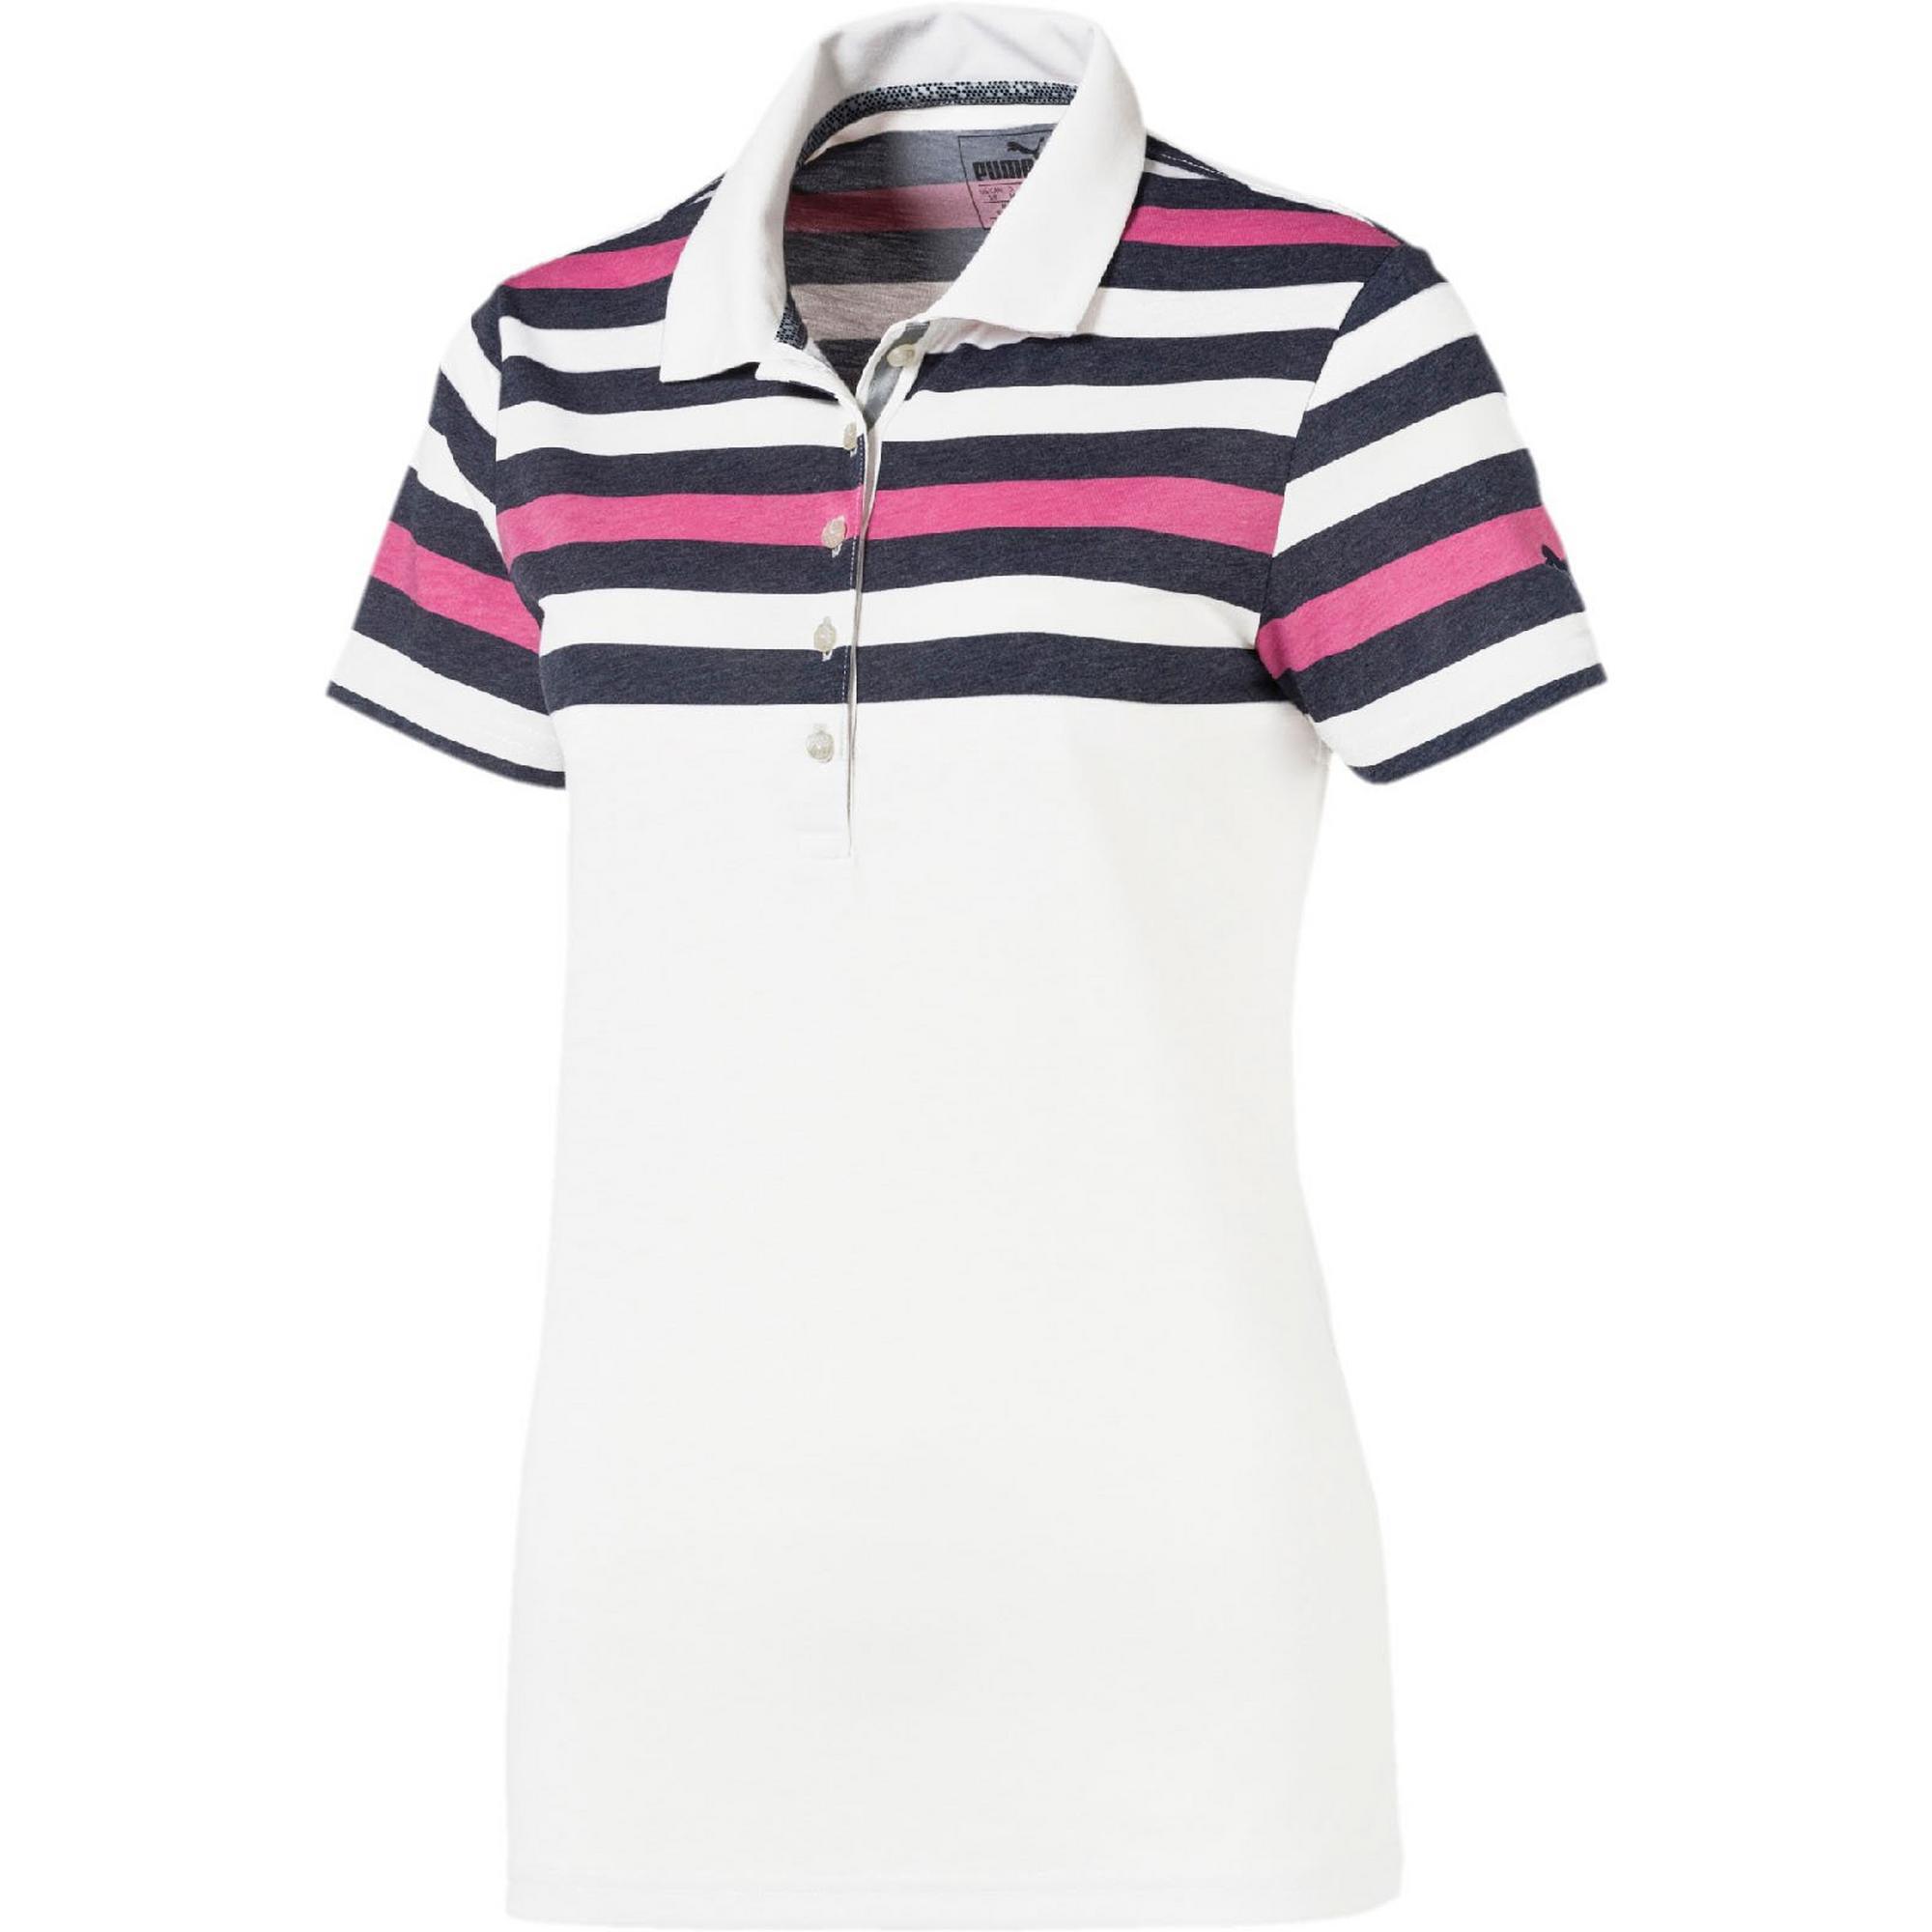 Women's Road Map Short Sleeve Polo